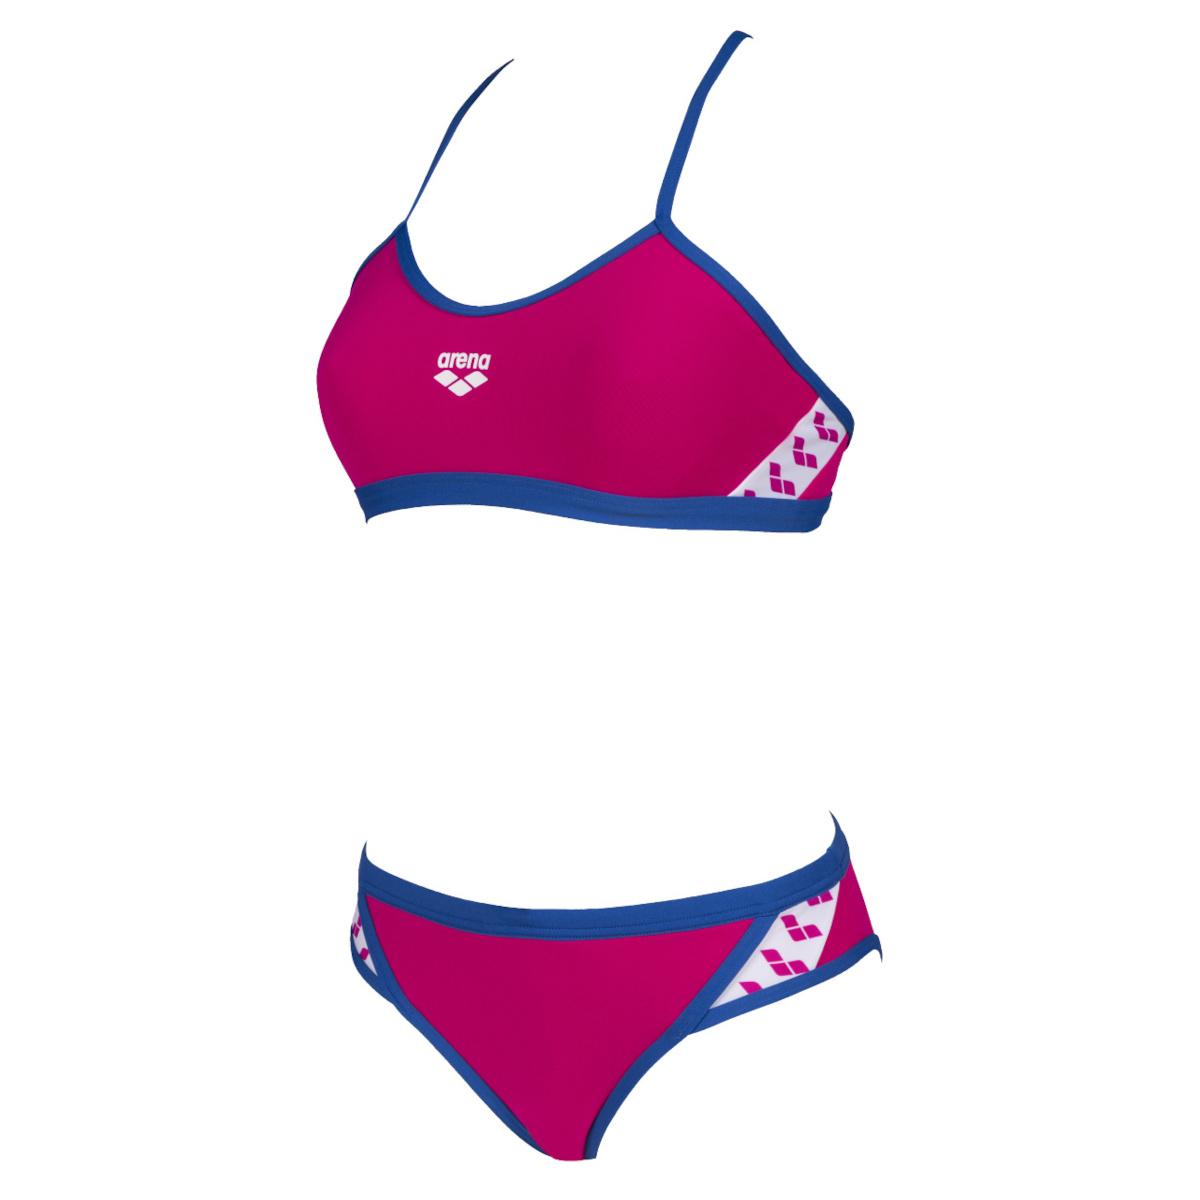 arena Team Stripe Women Bikini - freak rose-royal